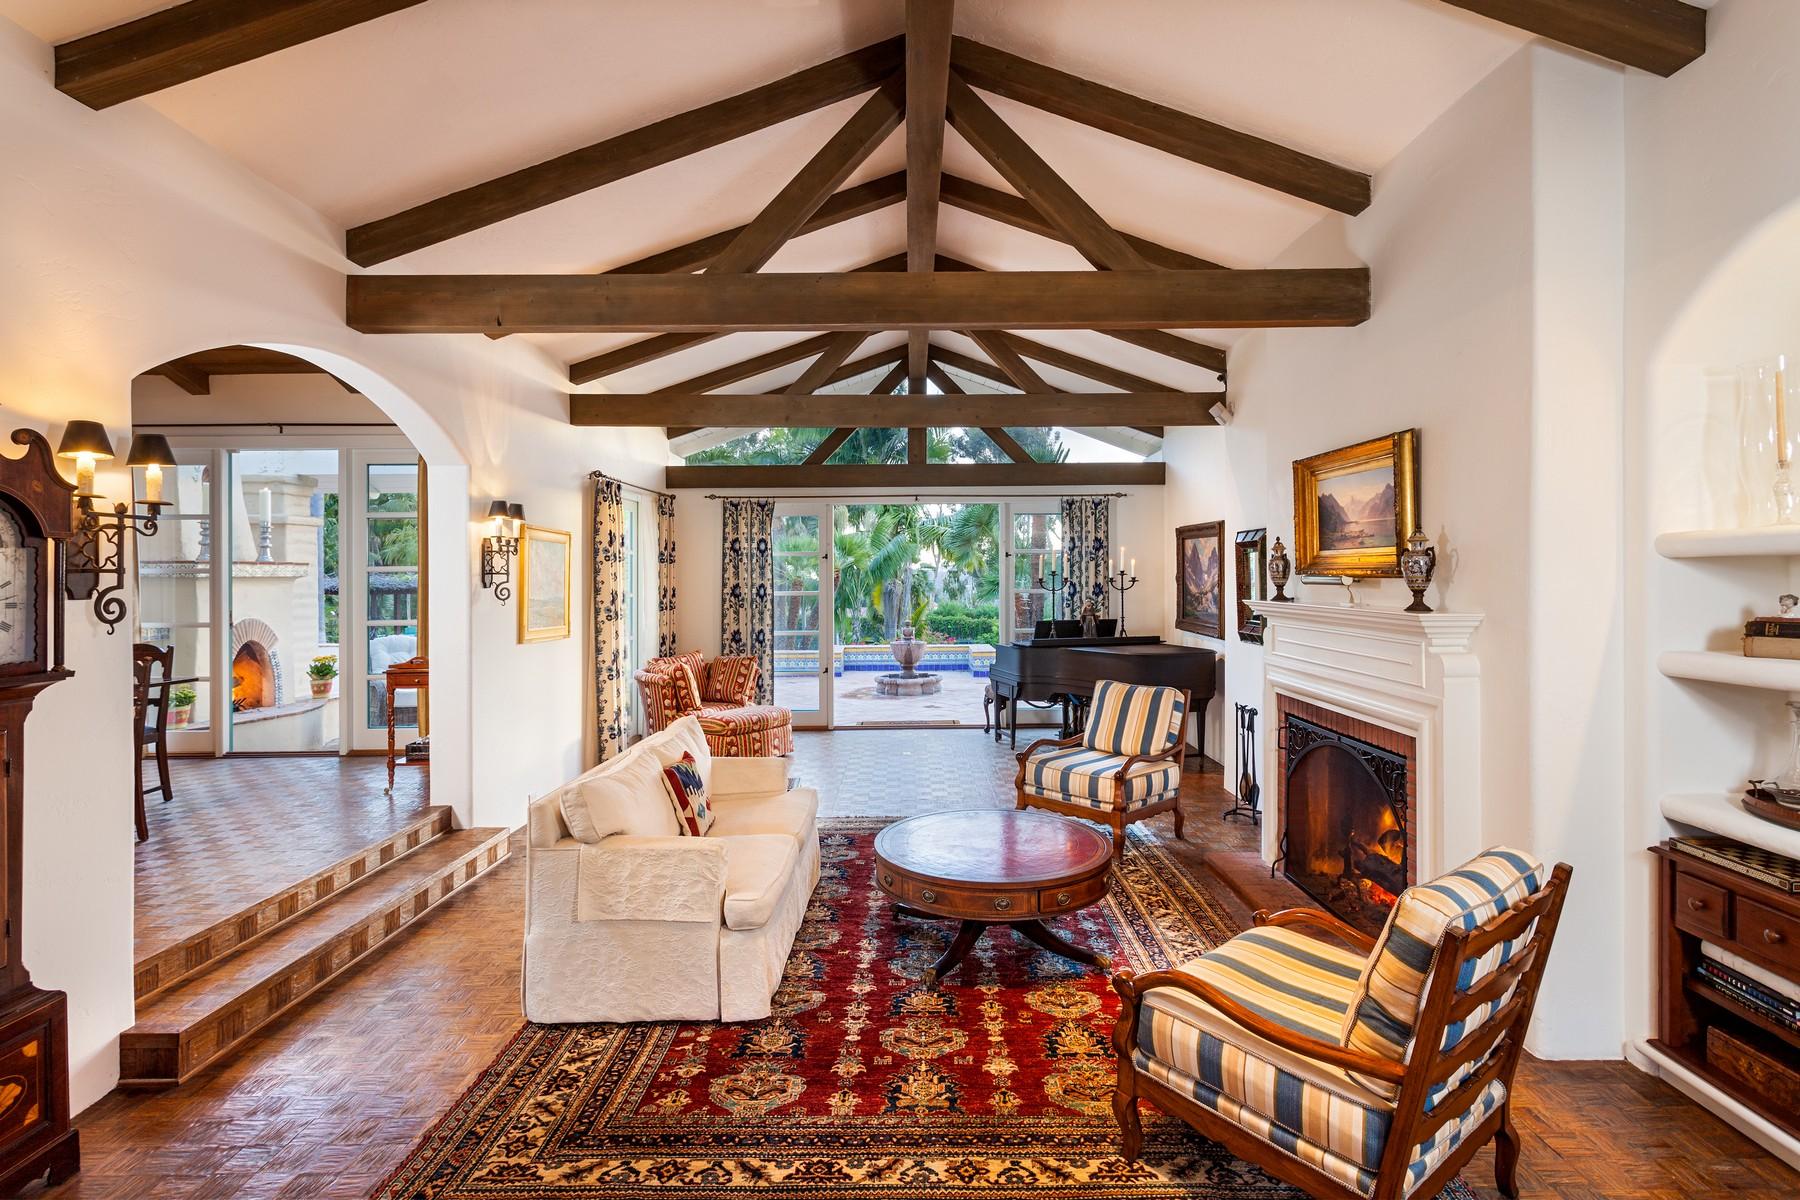 Property For Sale at 5109 El Mirlo